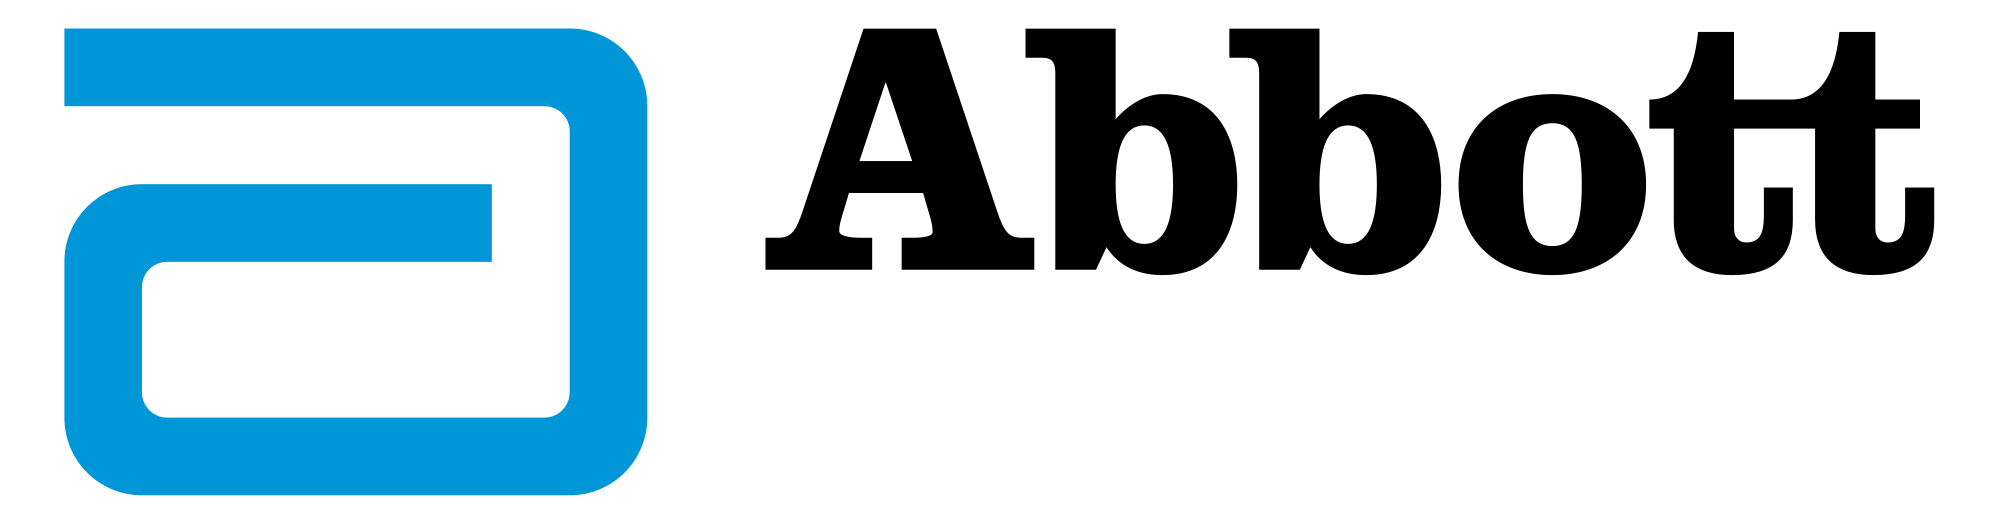 Abbot Laboratories Logo PNG Transparent Abbot Laboratories Logo.PNG.